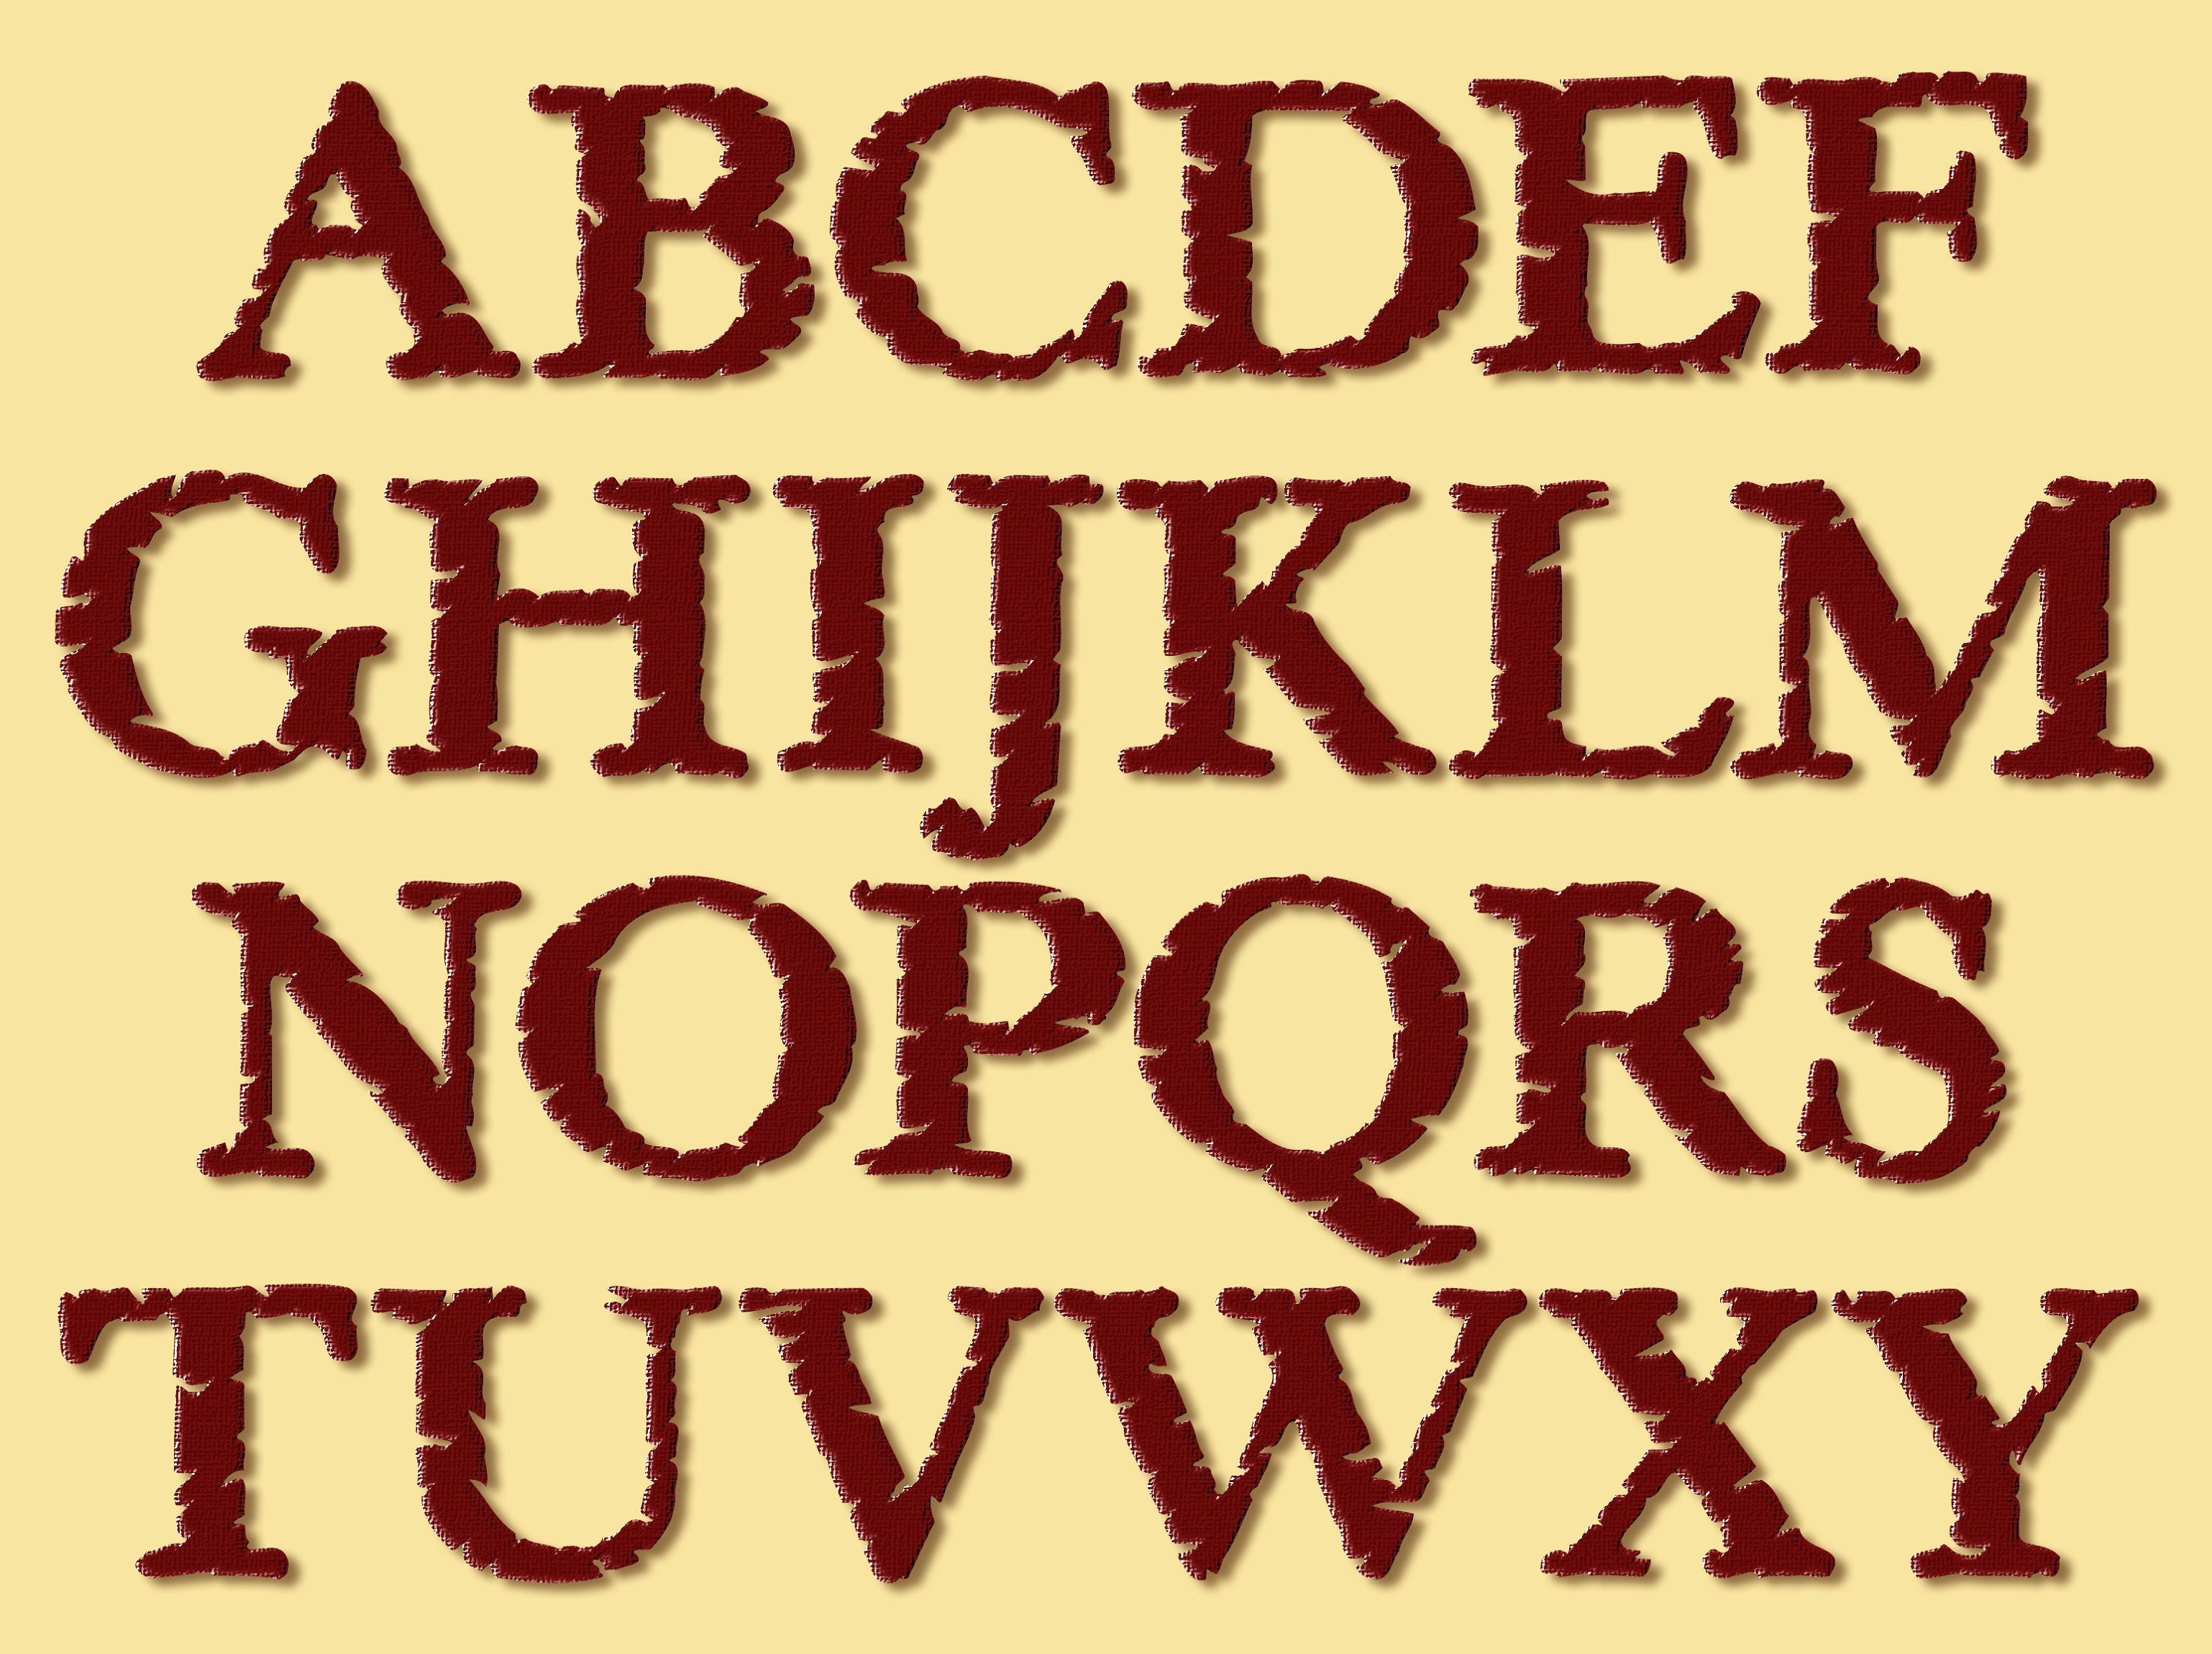 alphabet capital letters interesting